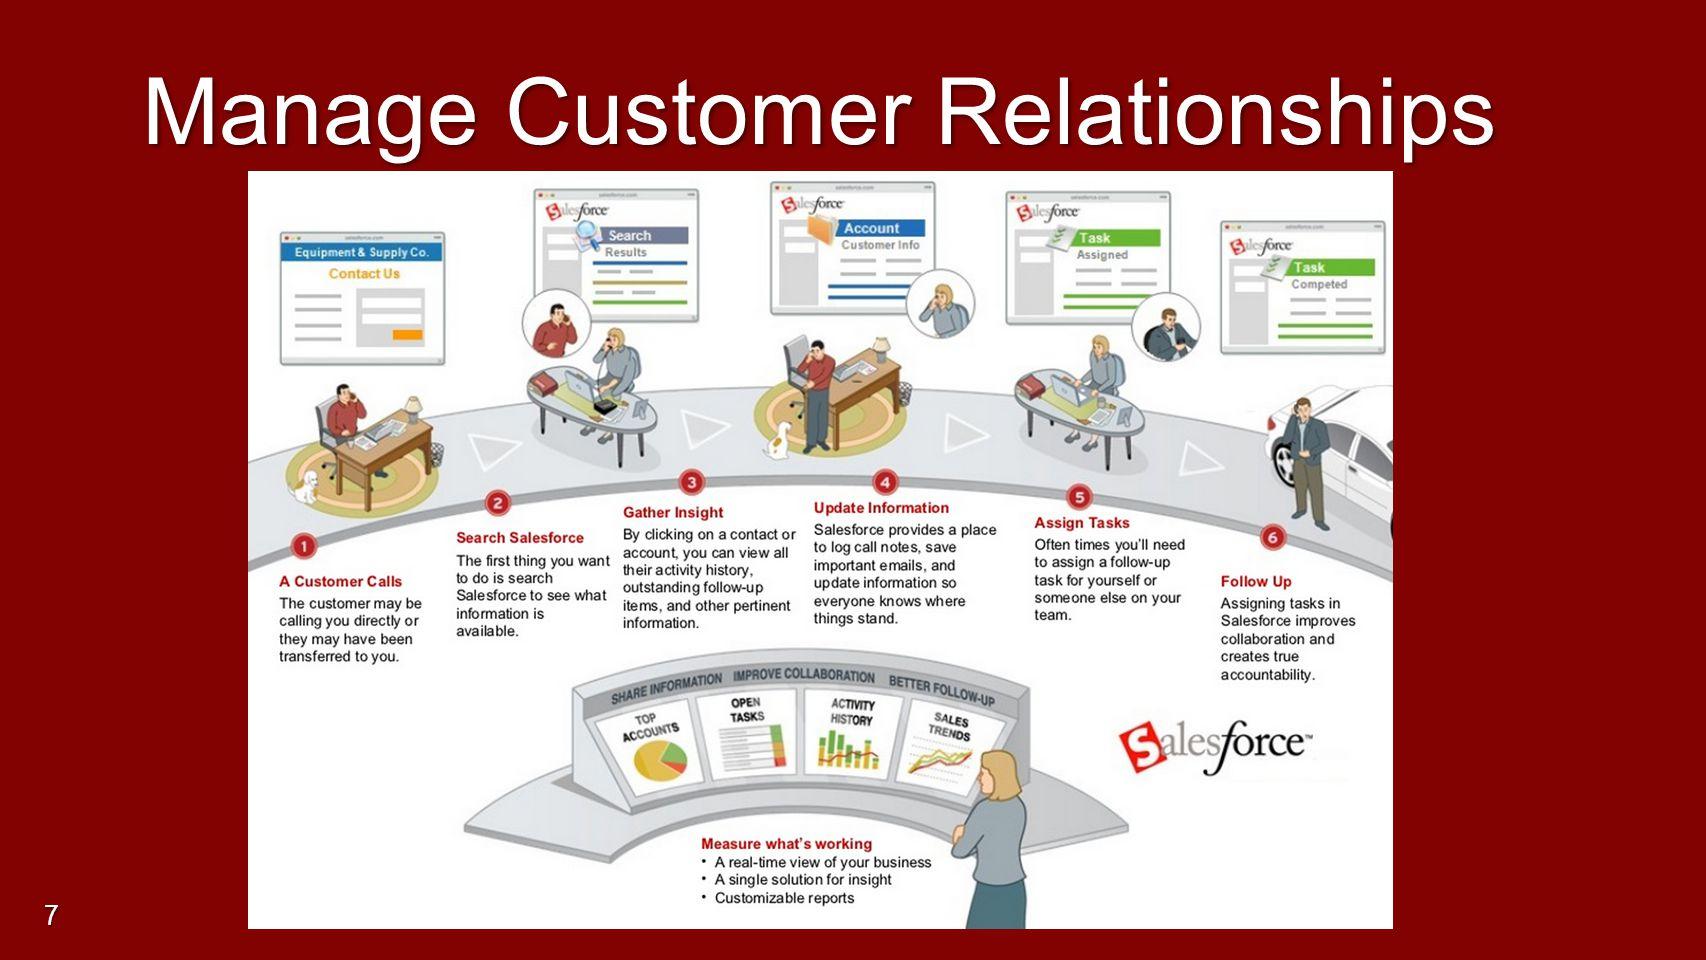 Manage Customer Relationships 7